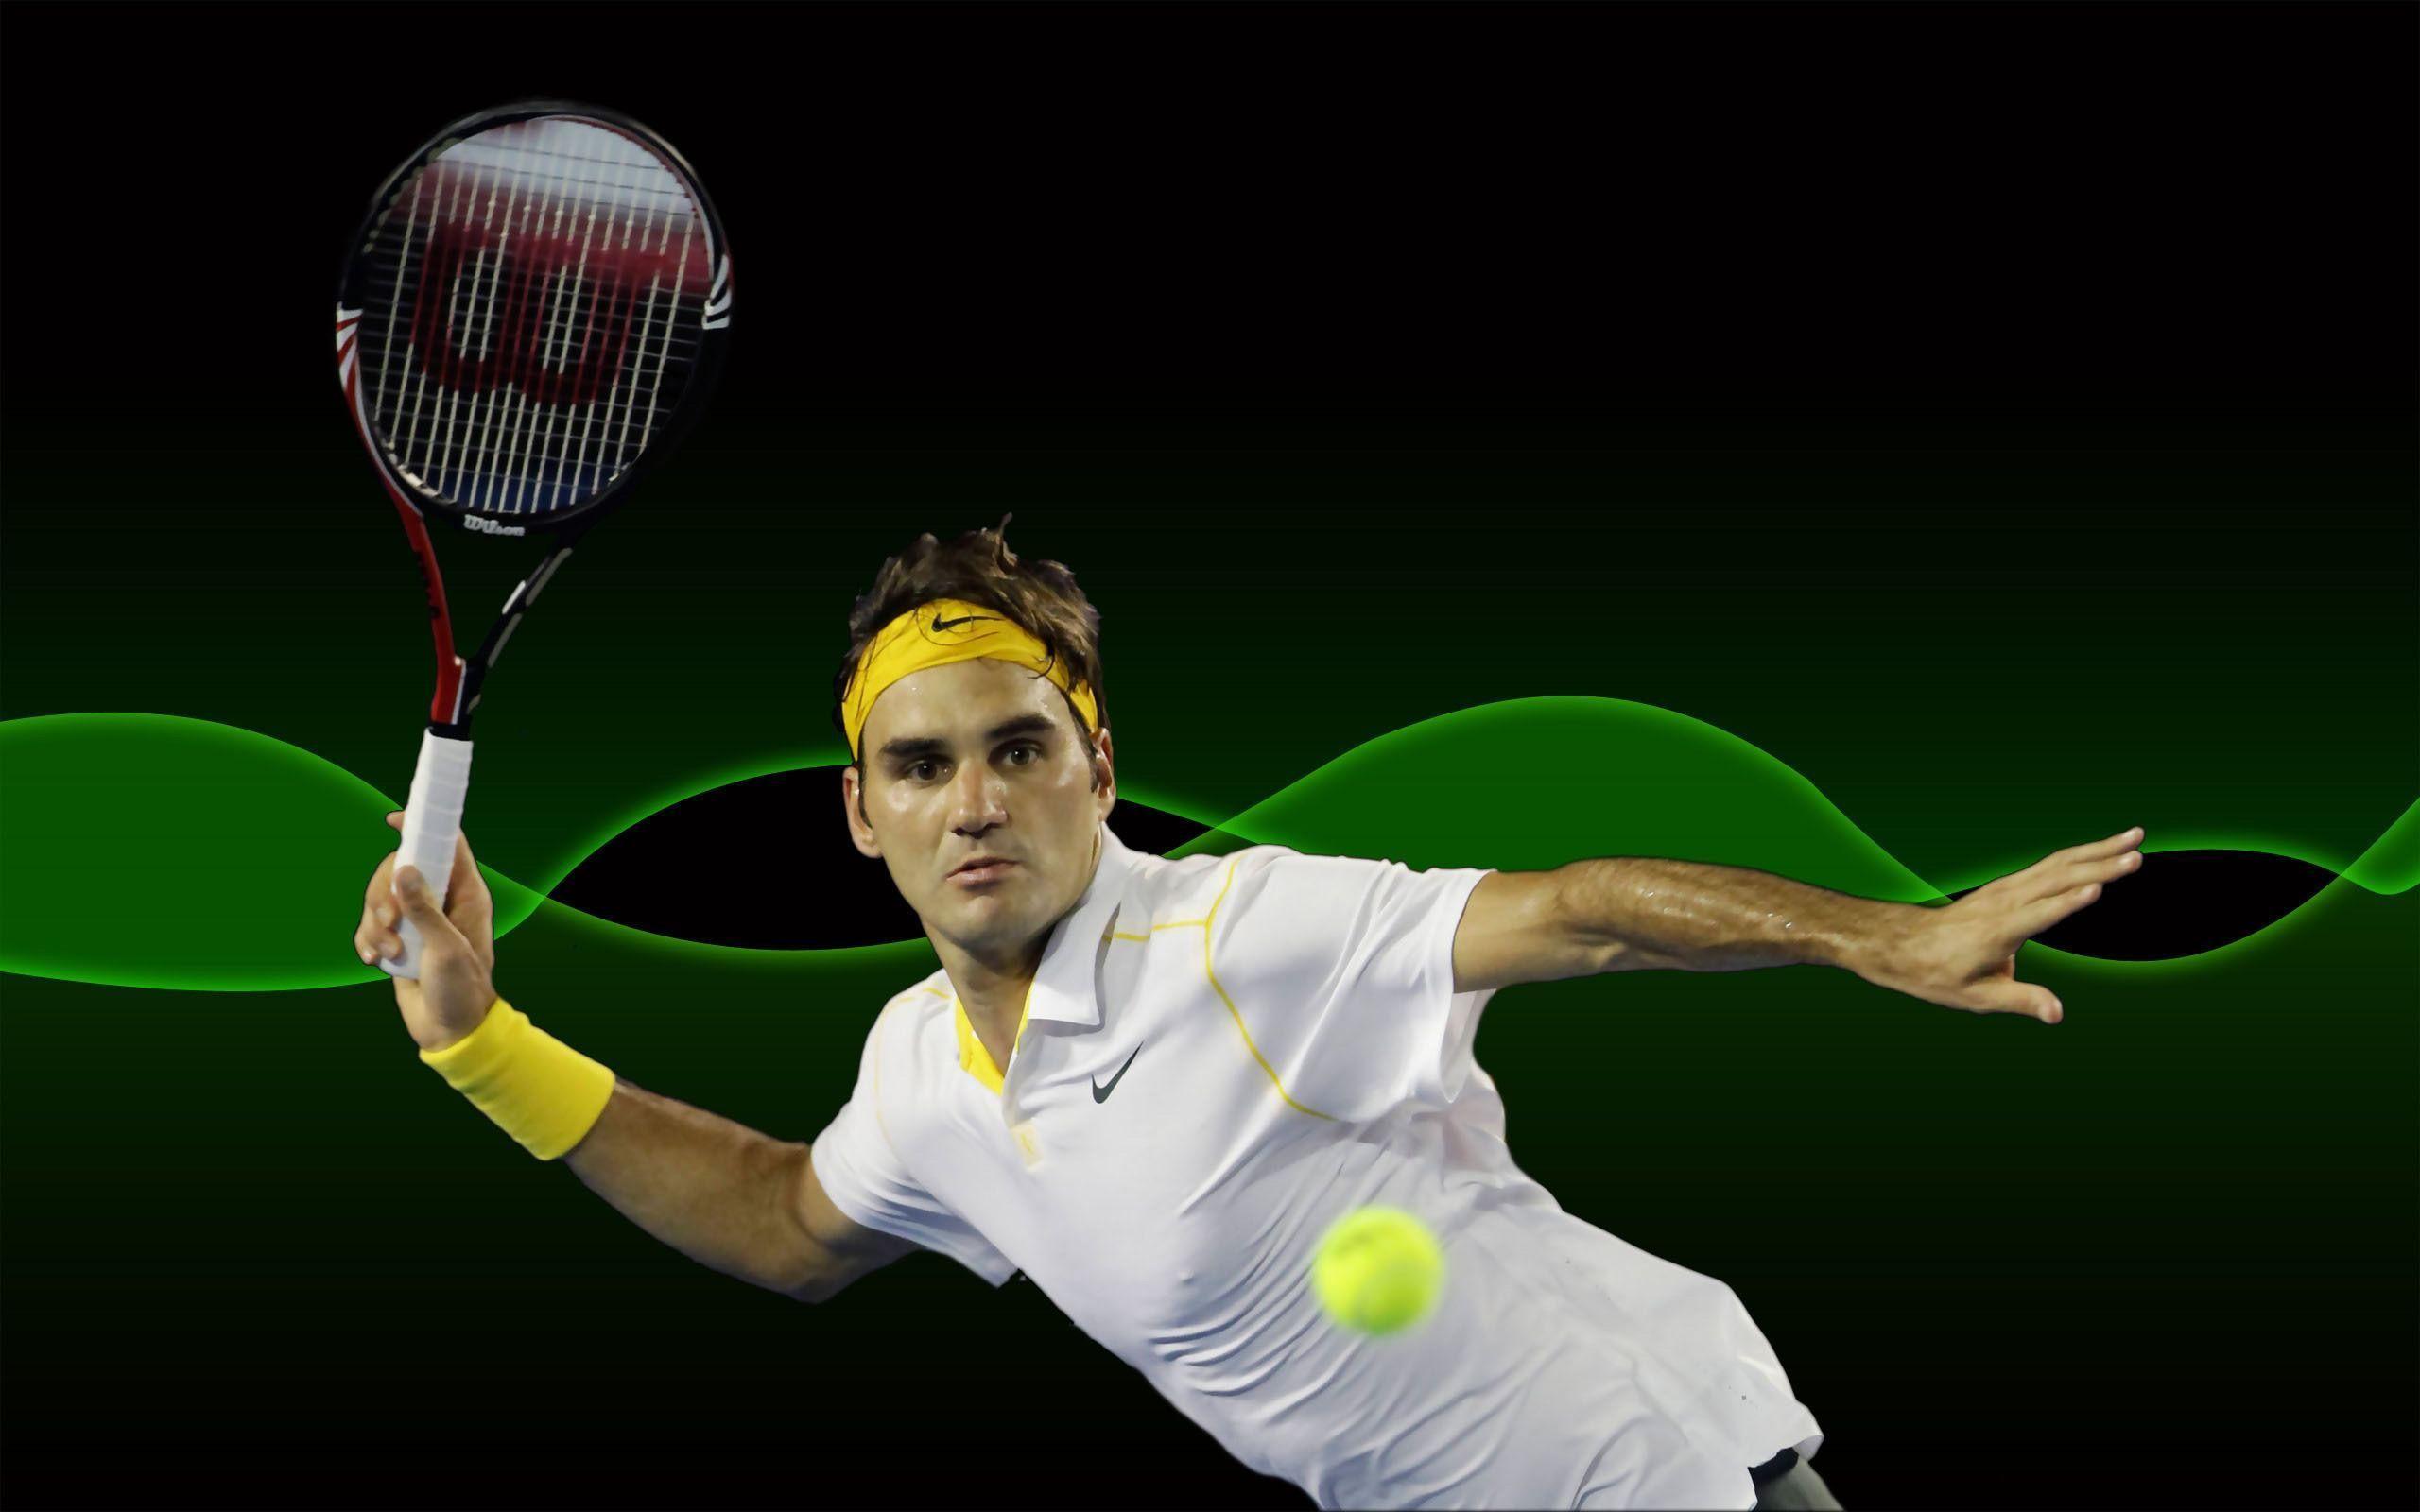 Roger Federer Desktop Wallpaper Roger Federer Images Cool Tennis Stars Tennis Roger Federer